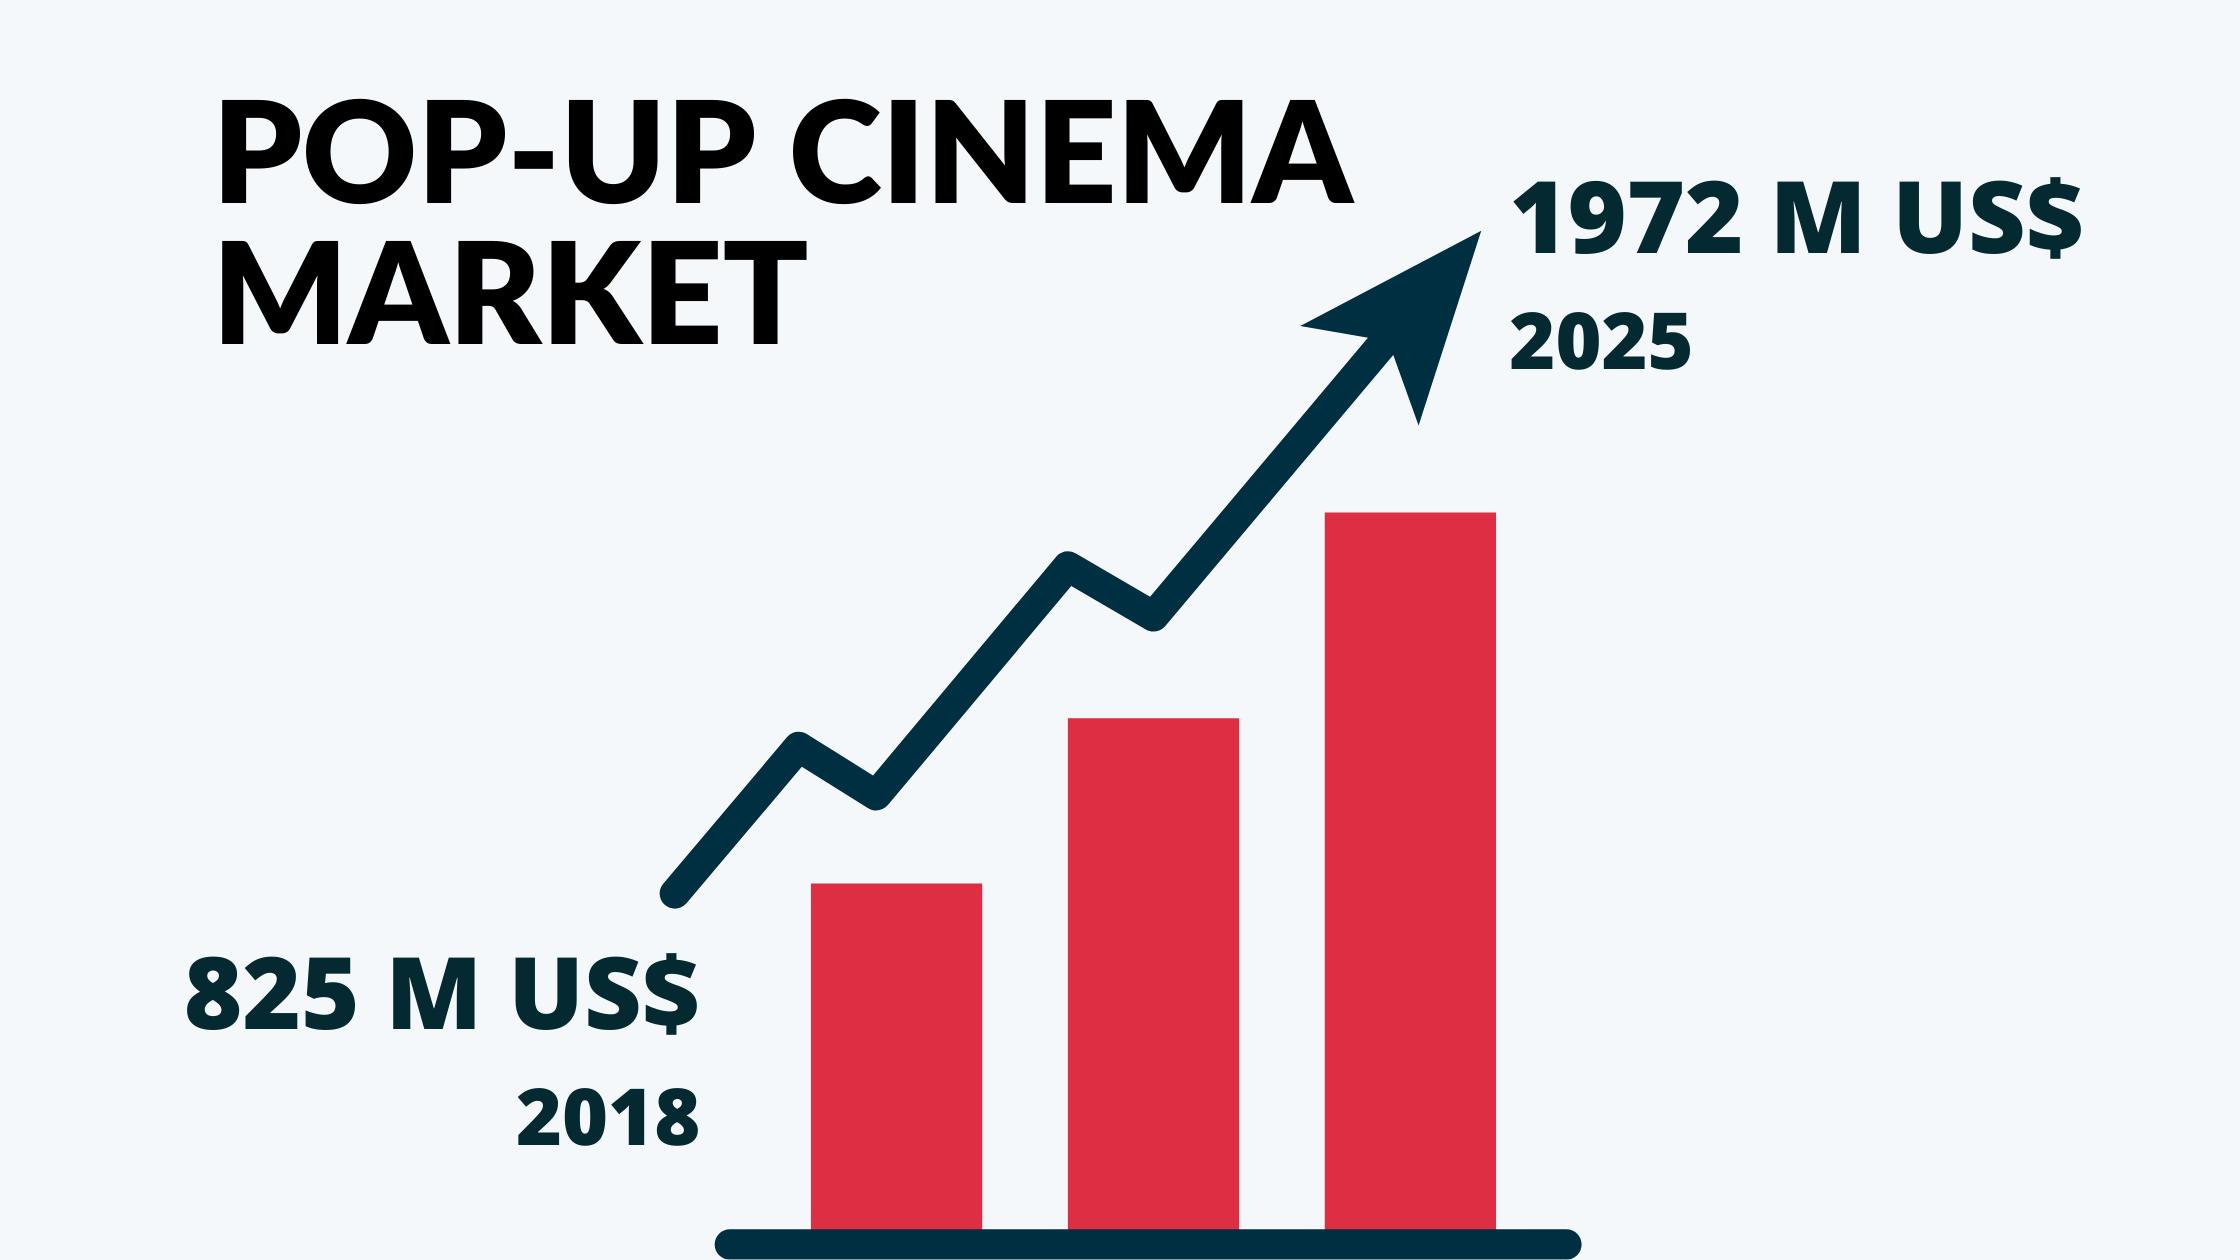 PopUp Cinema Market Size